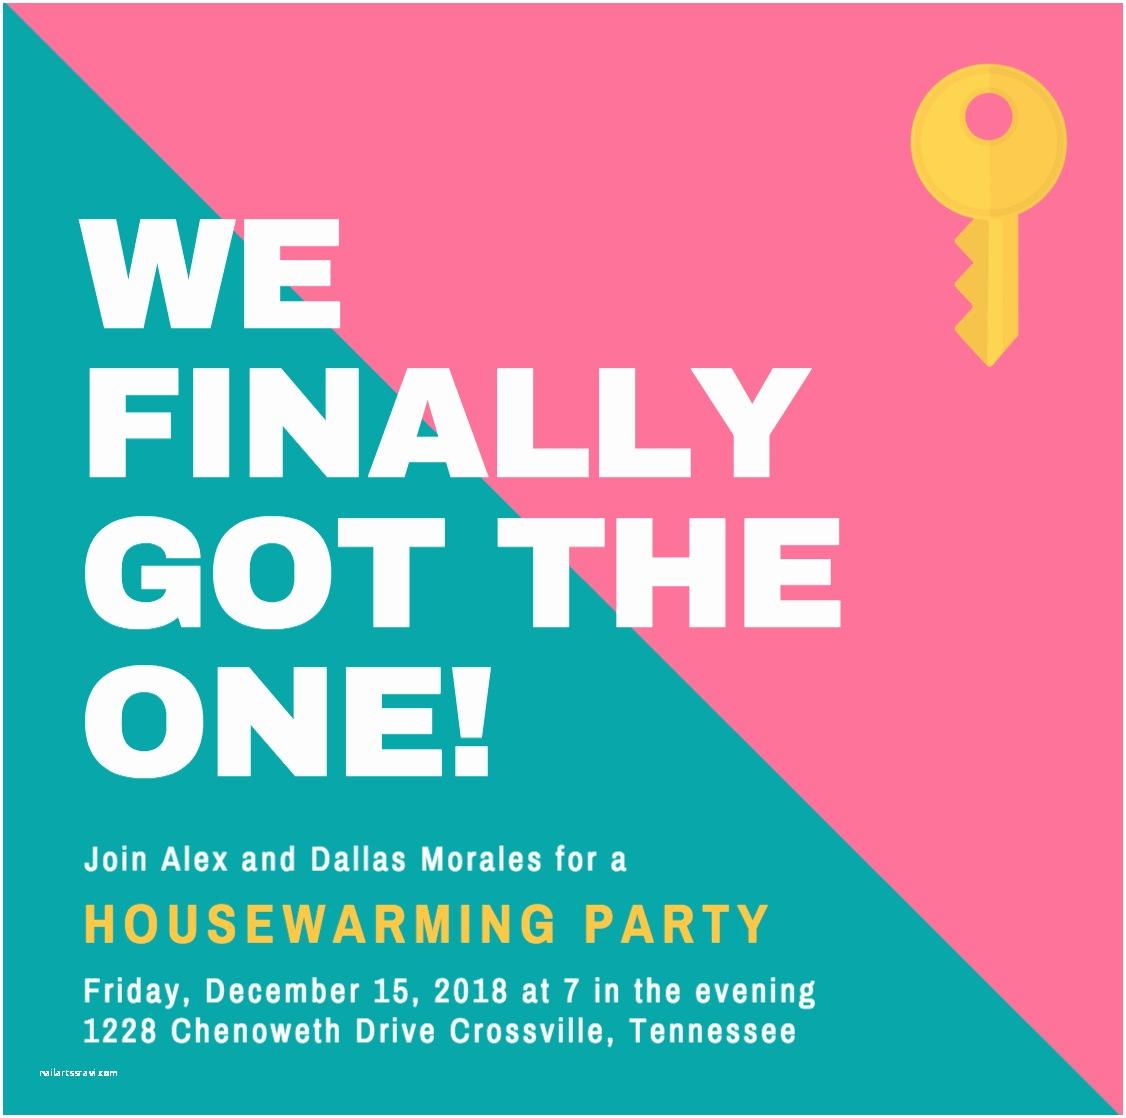 /housewarming/housewarming Invitations Free Design Your Own Custom Housewarming Invitations Canva